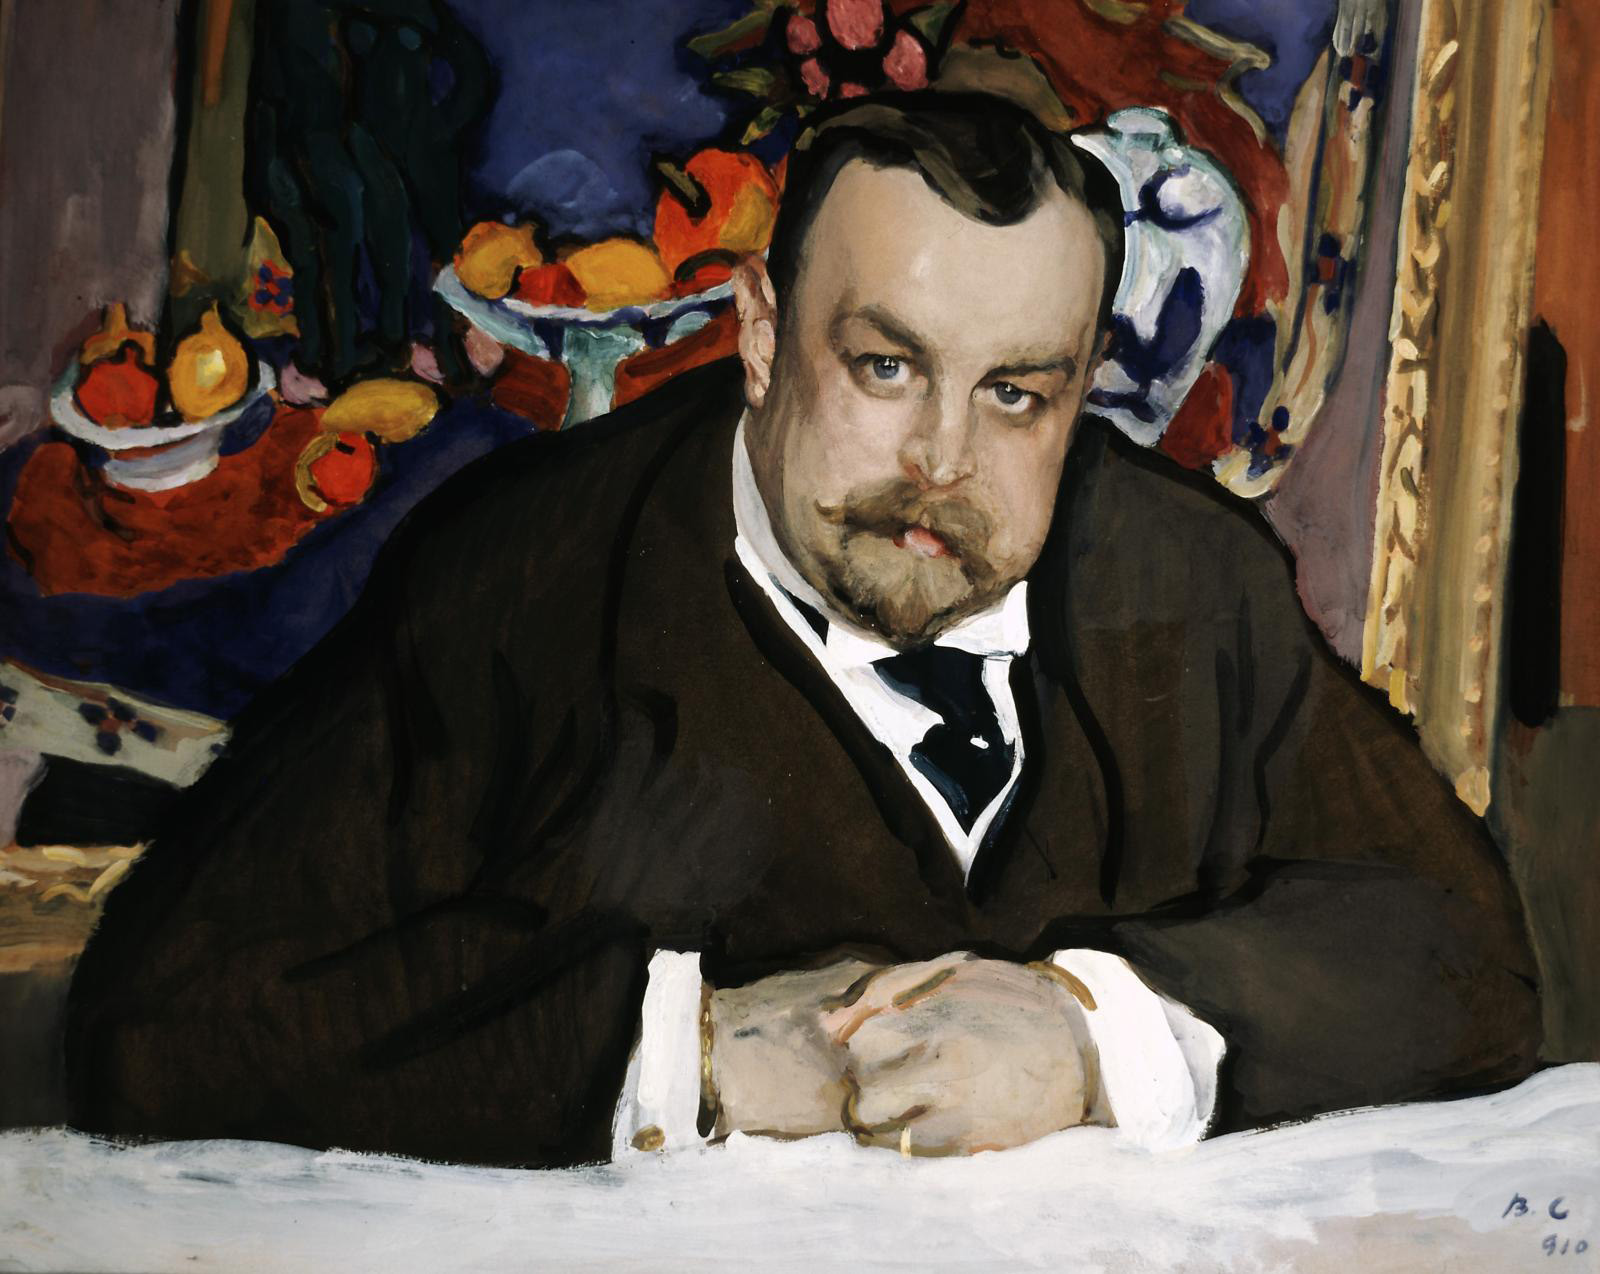 Valentin Serov (1865–1911), Portrait du collectionneur Ivan Morozov (Portrait of the Collector Ivan Morozov, 1910), tempera on cardboard, 63.5 x 77 cm/25 x 30.31 in. Tretyakov National Gallery, Moscow